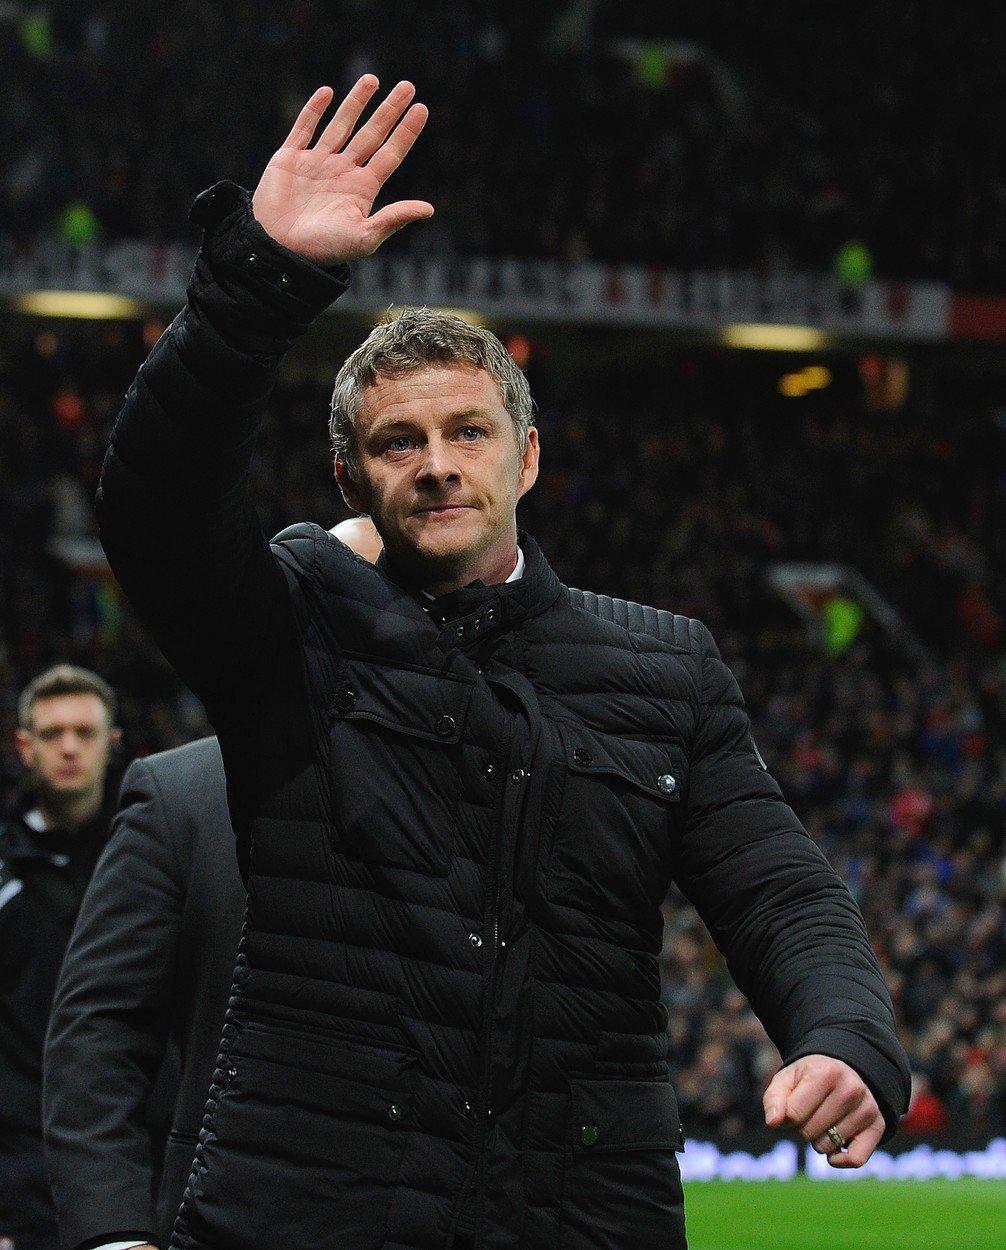 Ole Gunnar Solskjaer je novým trenérem Manchesteru United